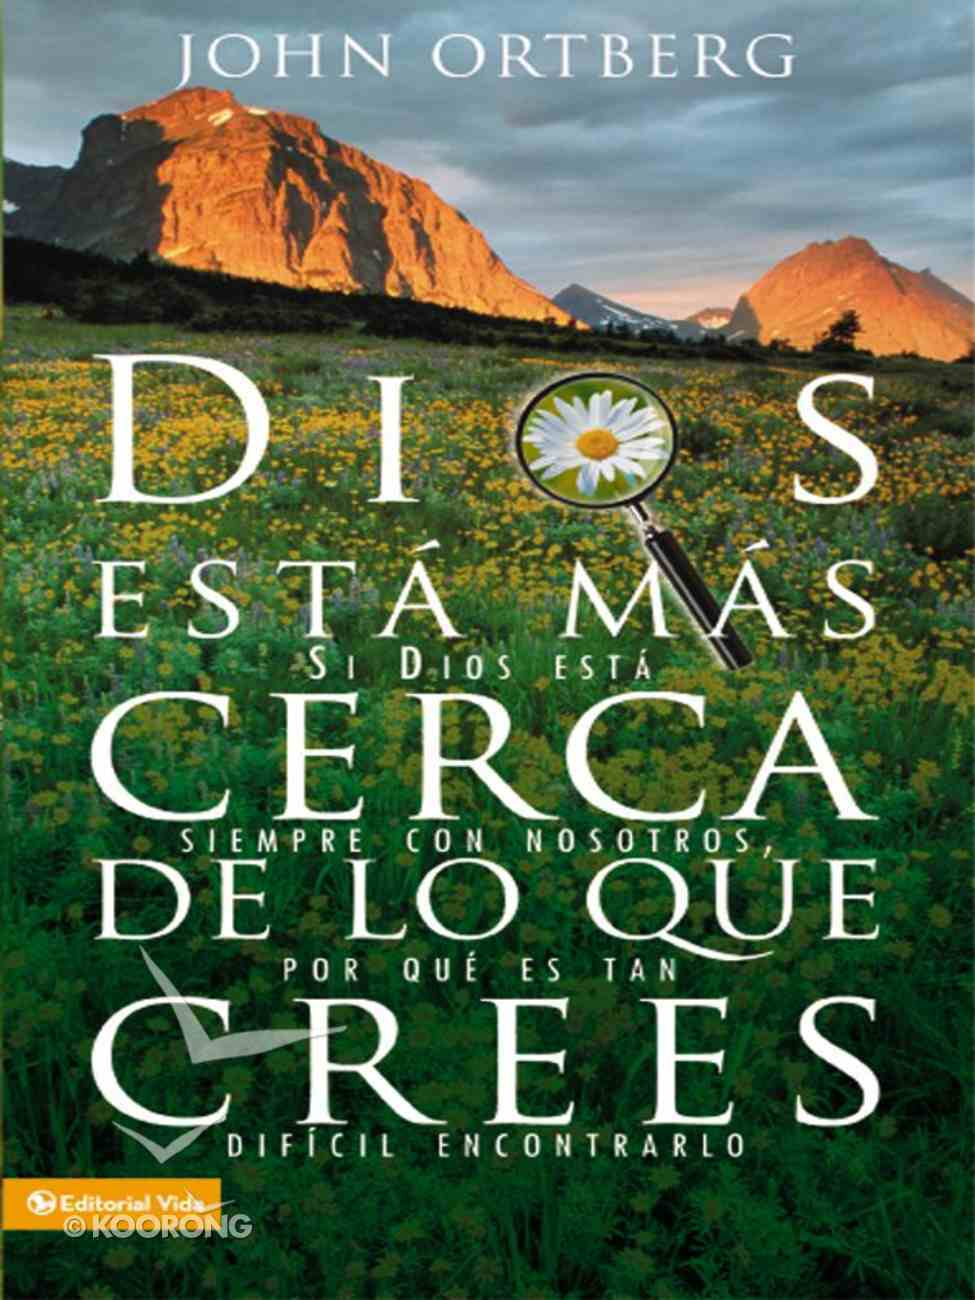 Dios Esta Mas Cerca De Lo Que Crees (Spanish) (Spa) (God Is Closer Than You Think) eBook